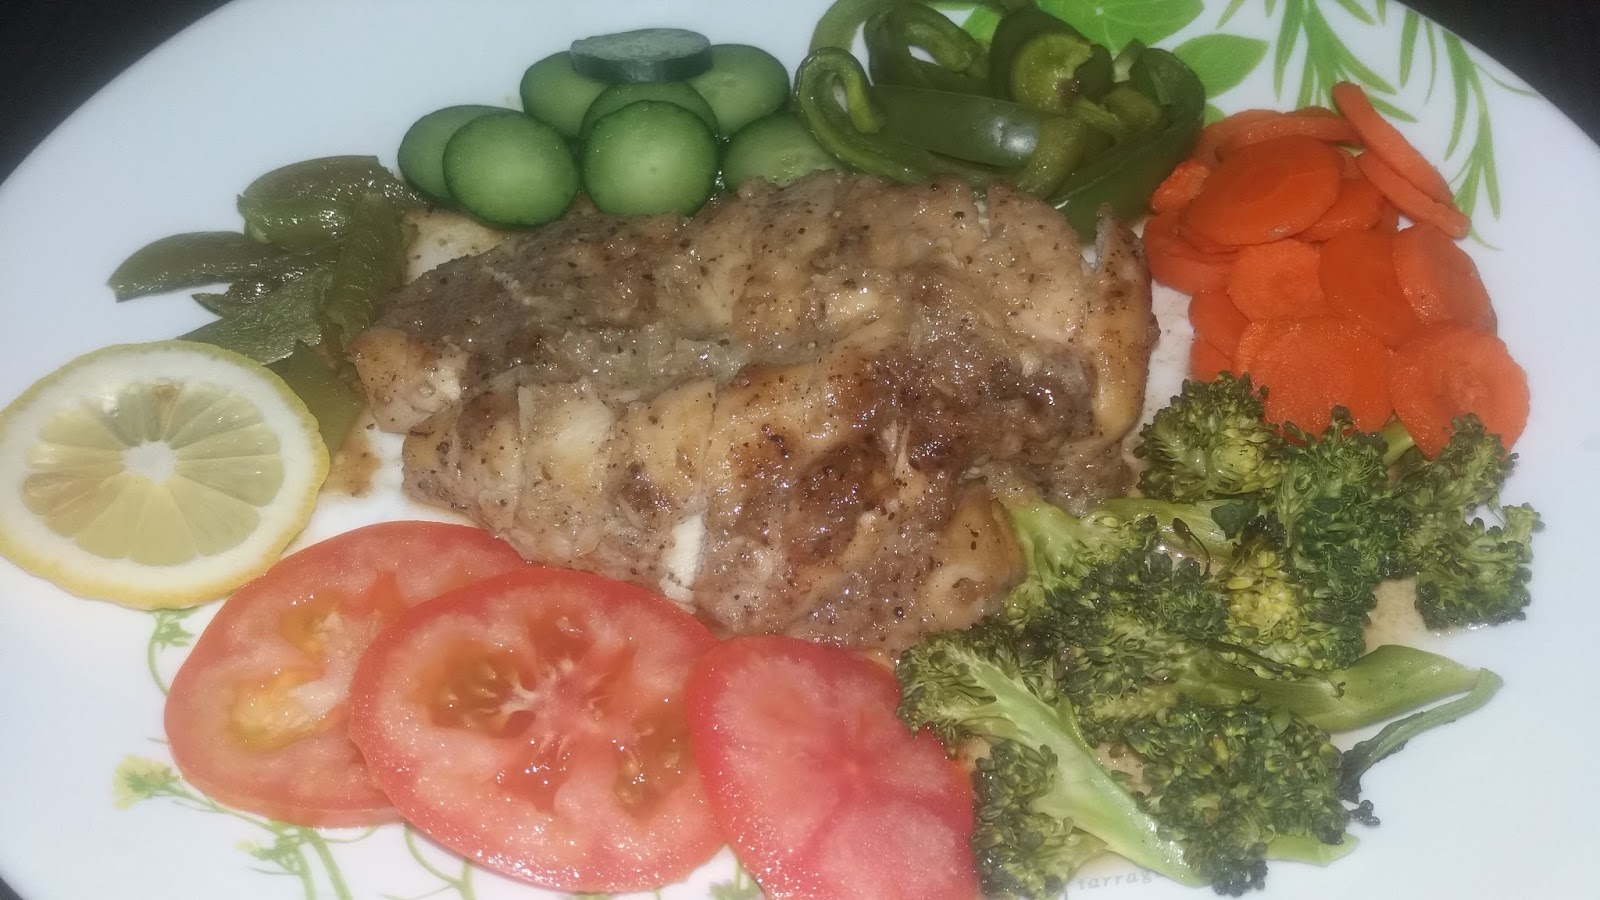 Resep Makanan Sehat yang Enak, Kaya Protein & Sayur